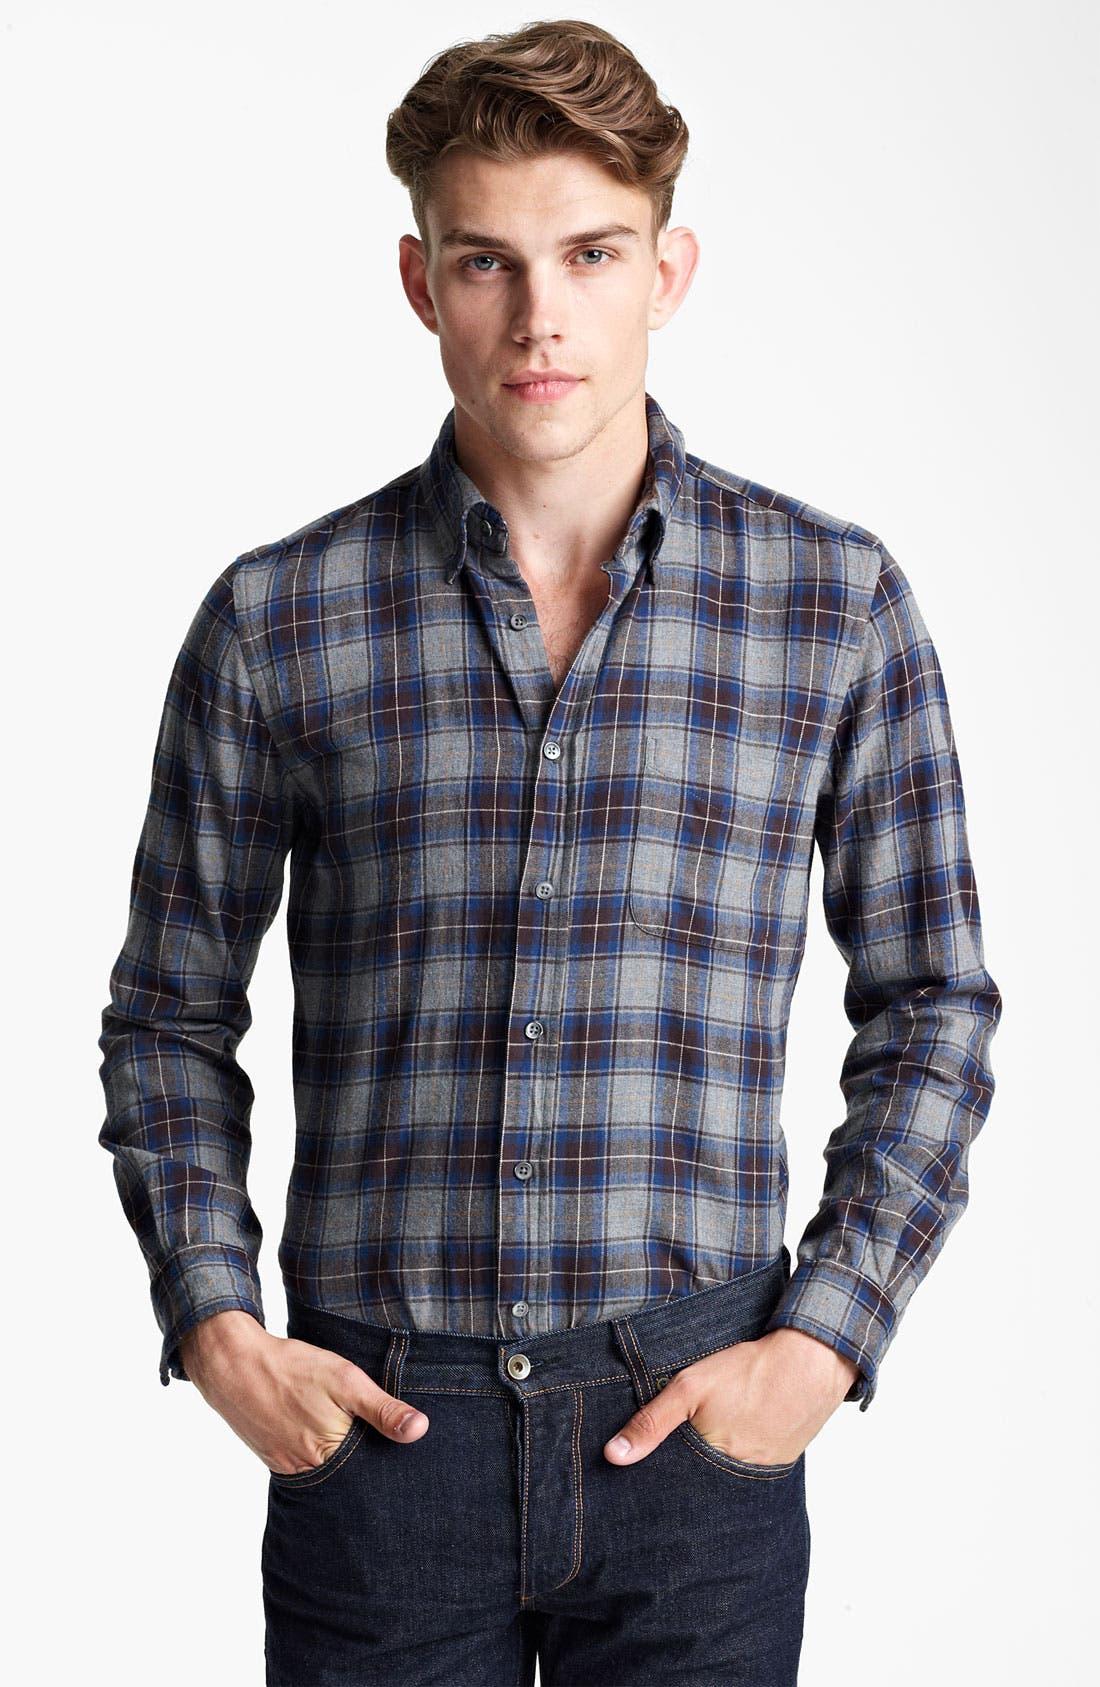 Main Image - Steven Alan 'Collegiate' Plaid Woven Shirt